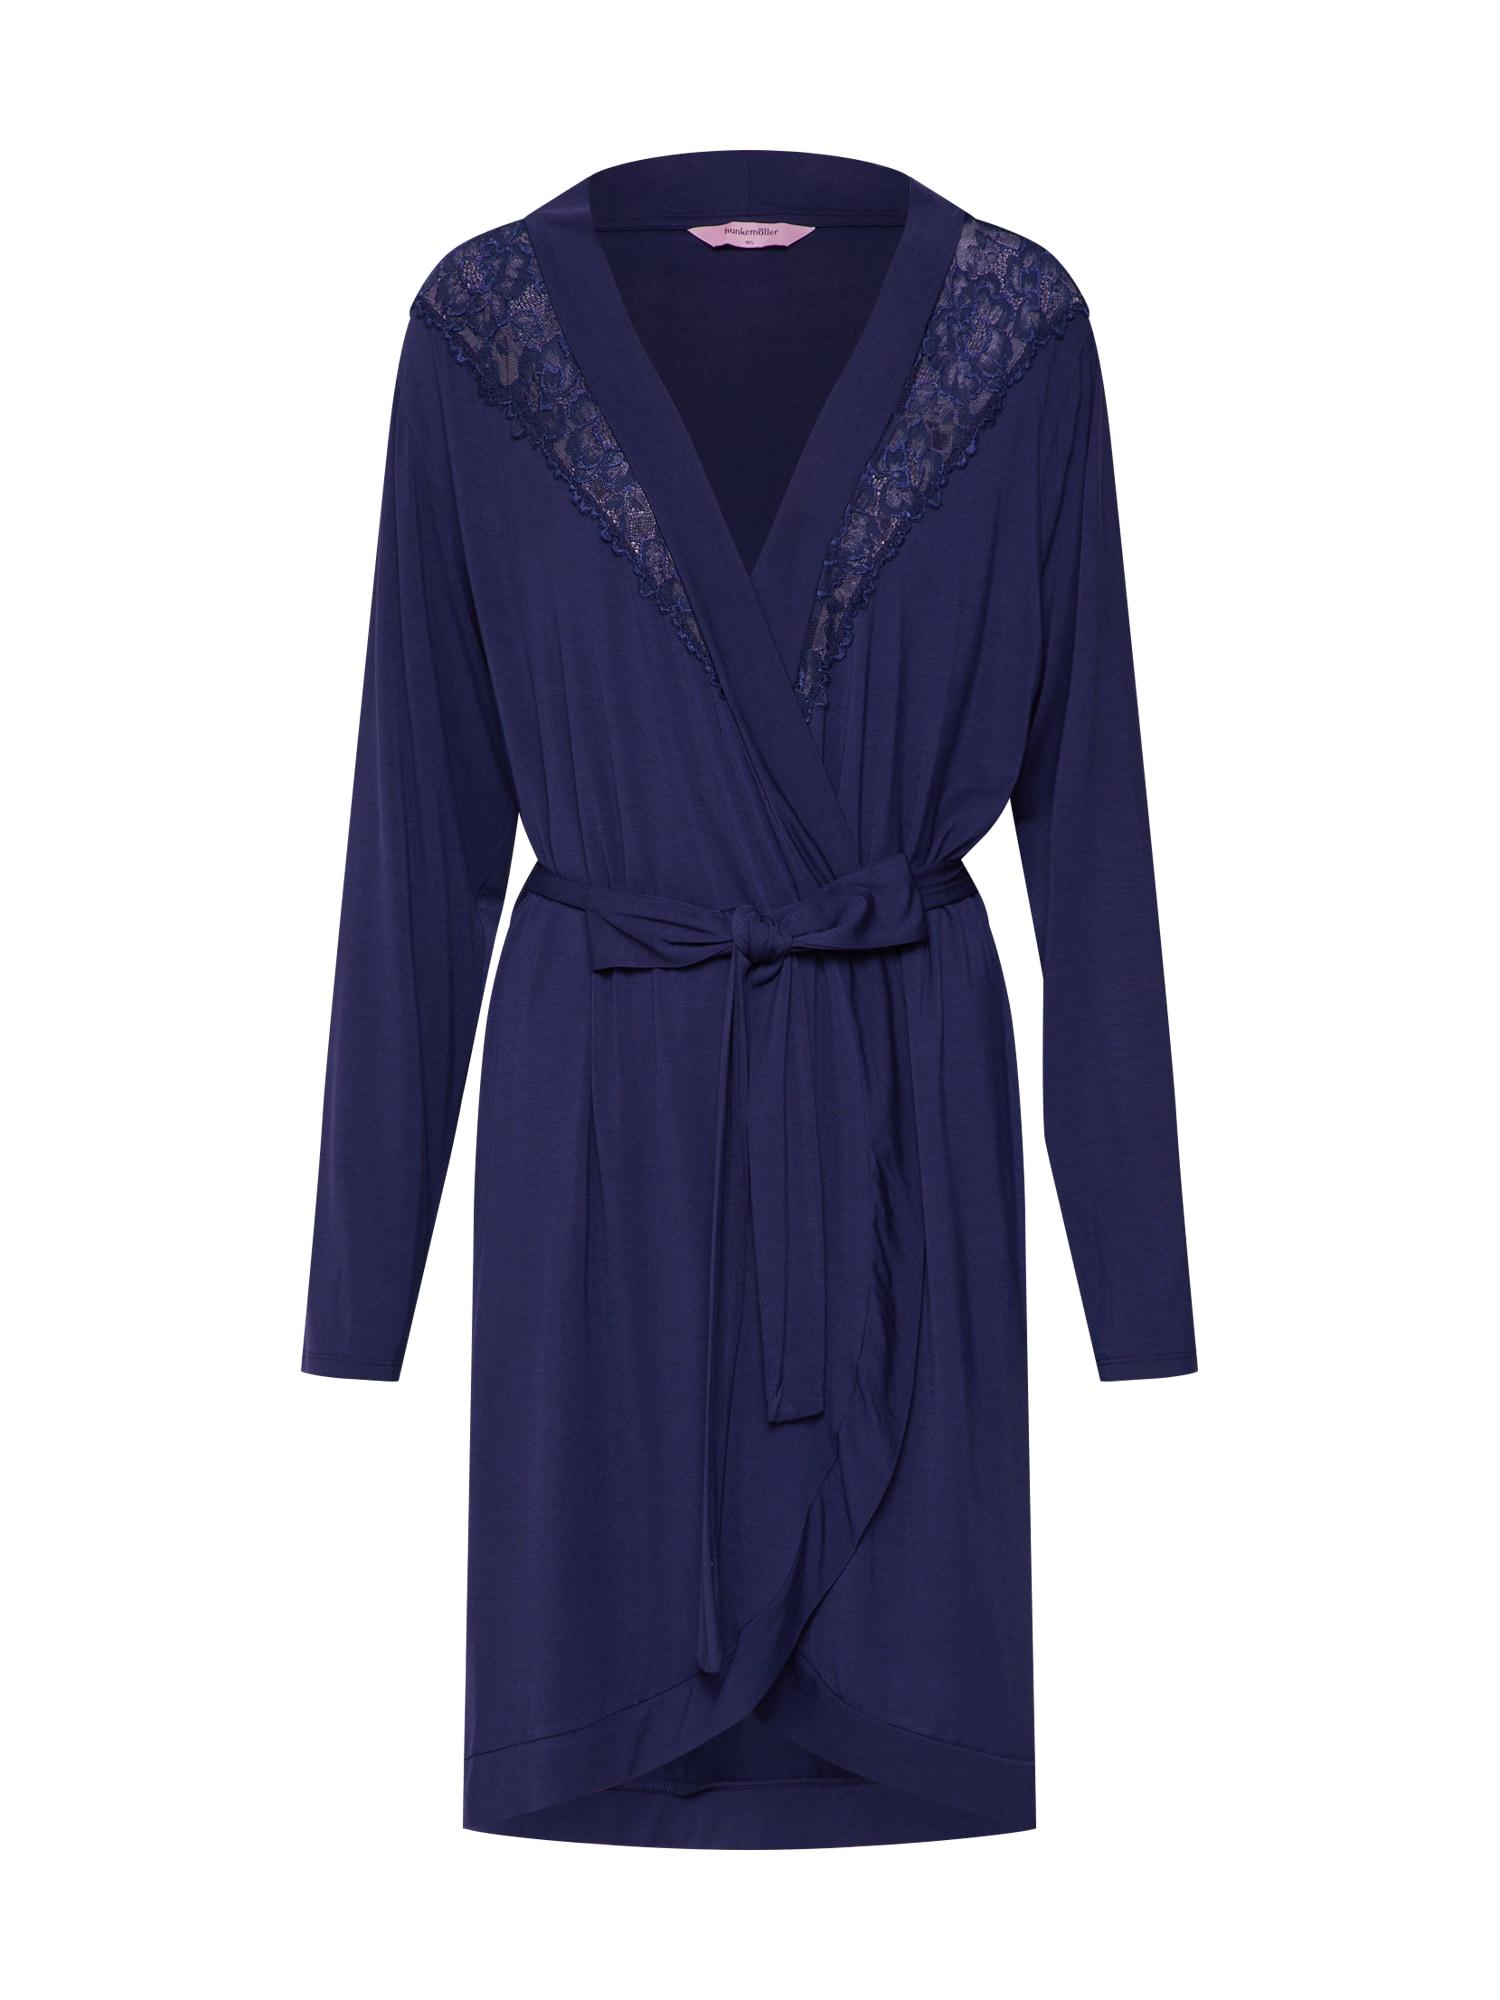 Morgenmantel 'Robe Modal Lace' | Bekleidung > Homewear > Morgenmäntel | Hunkemöller